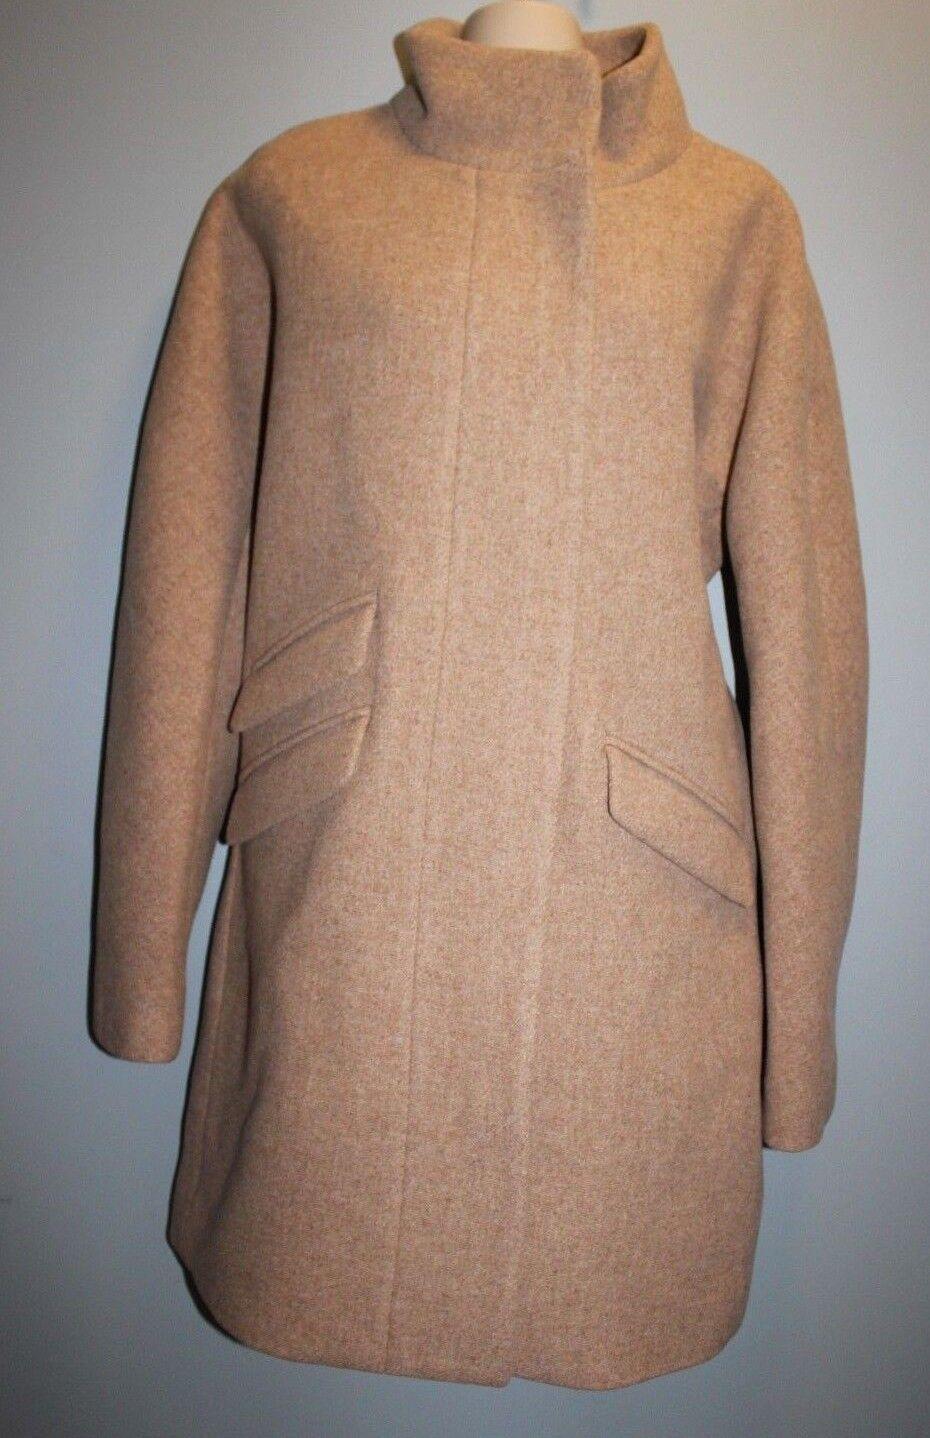 NWT JCrew  350 Cocoon Coat Italian Stadium-Cloth Wool 12 SANDSTONE G8447